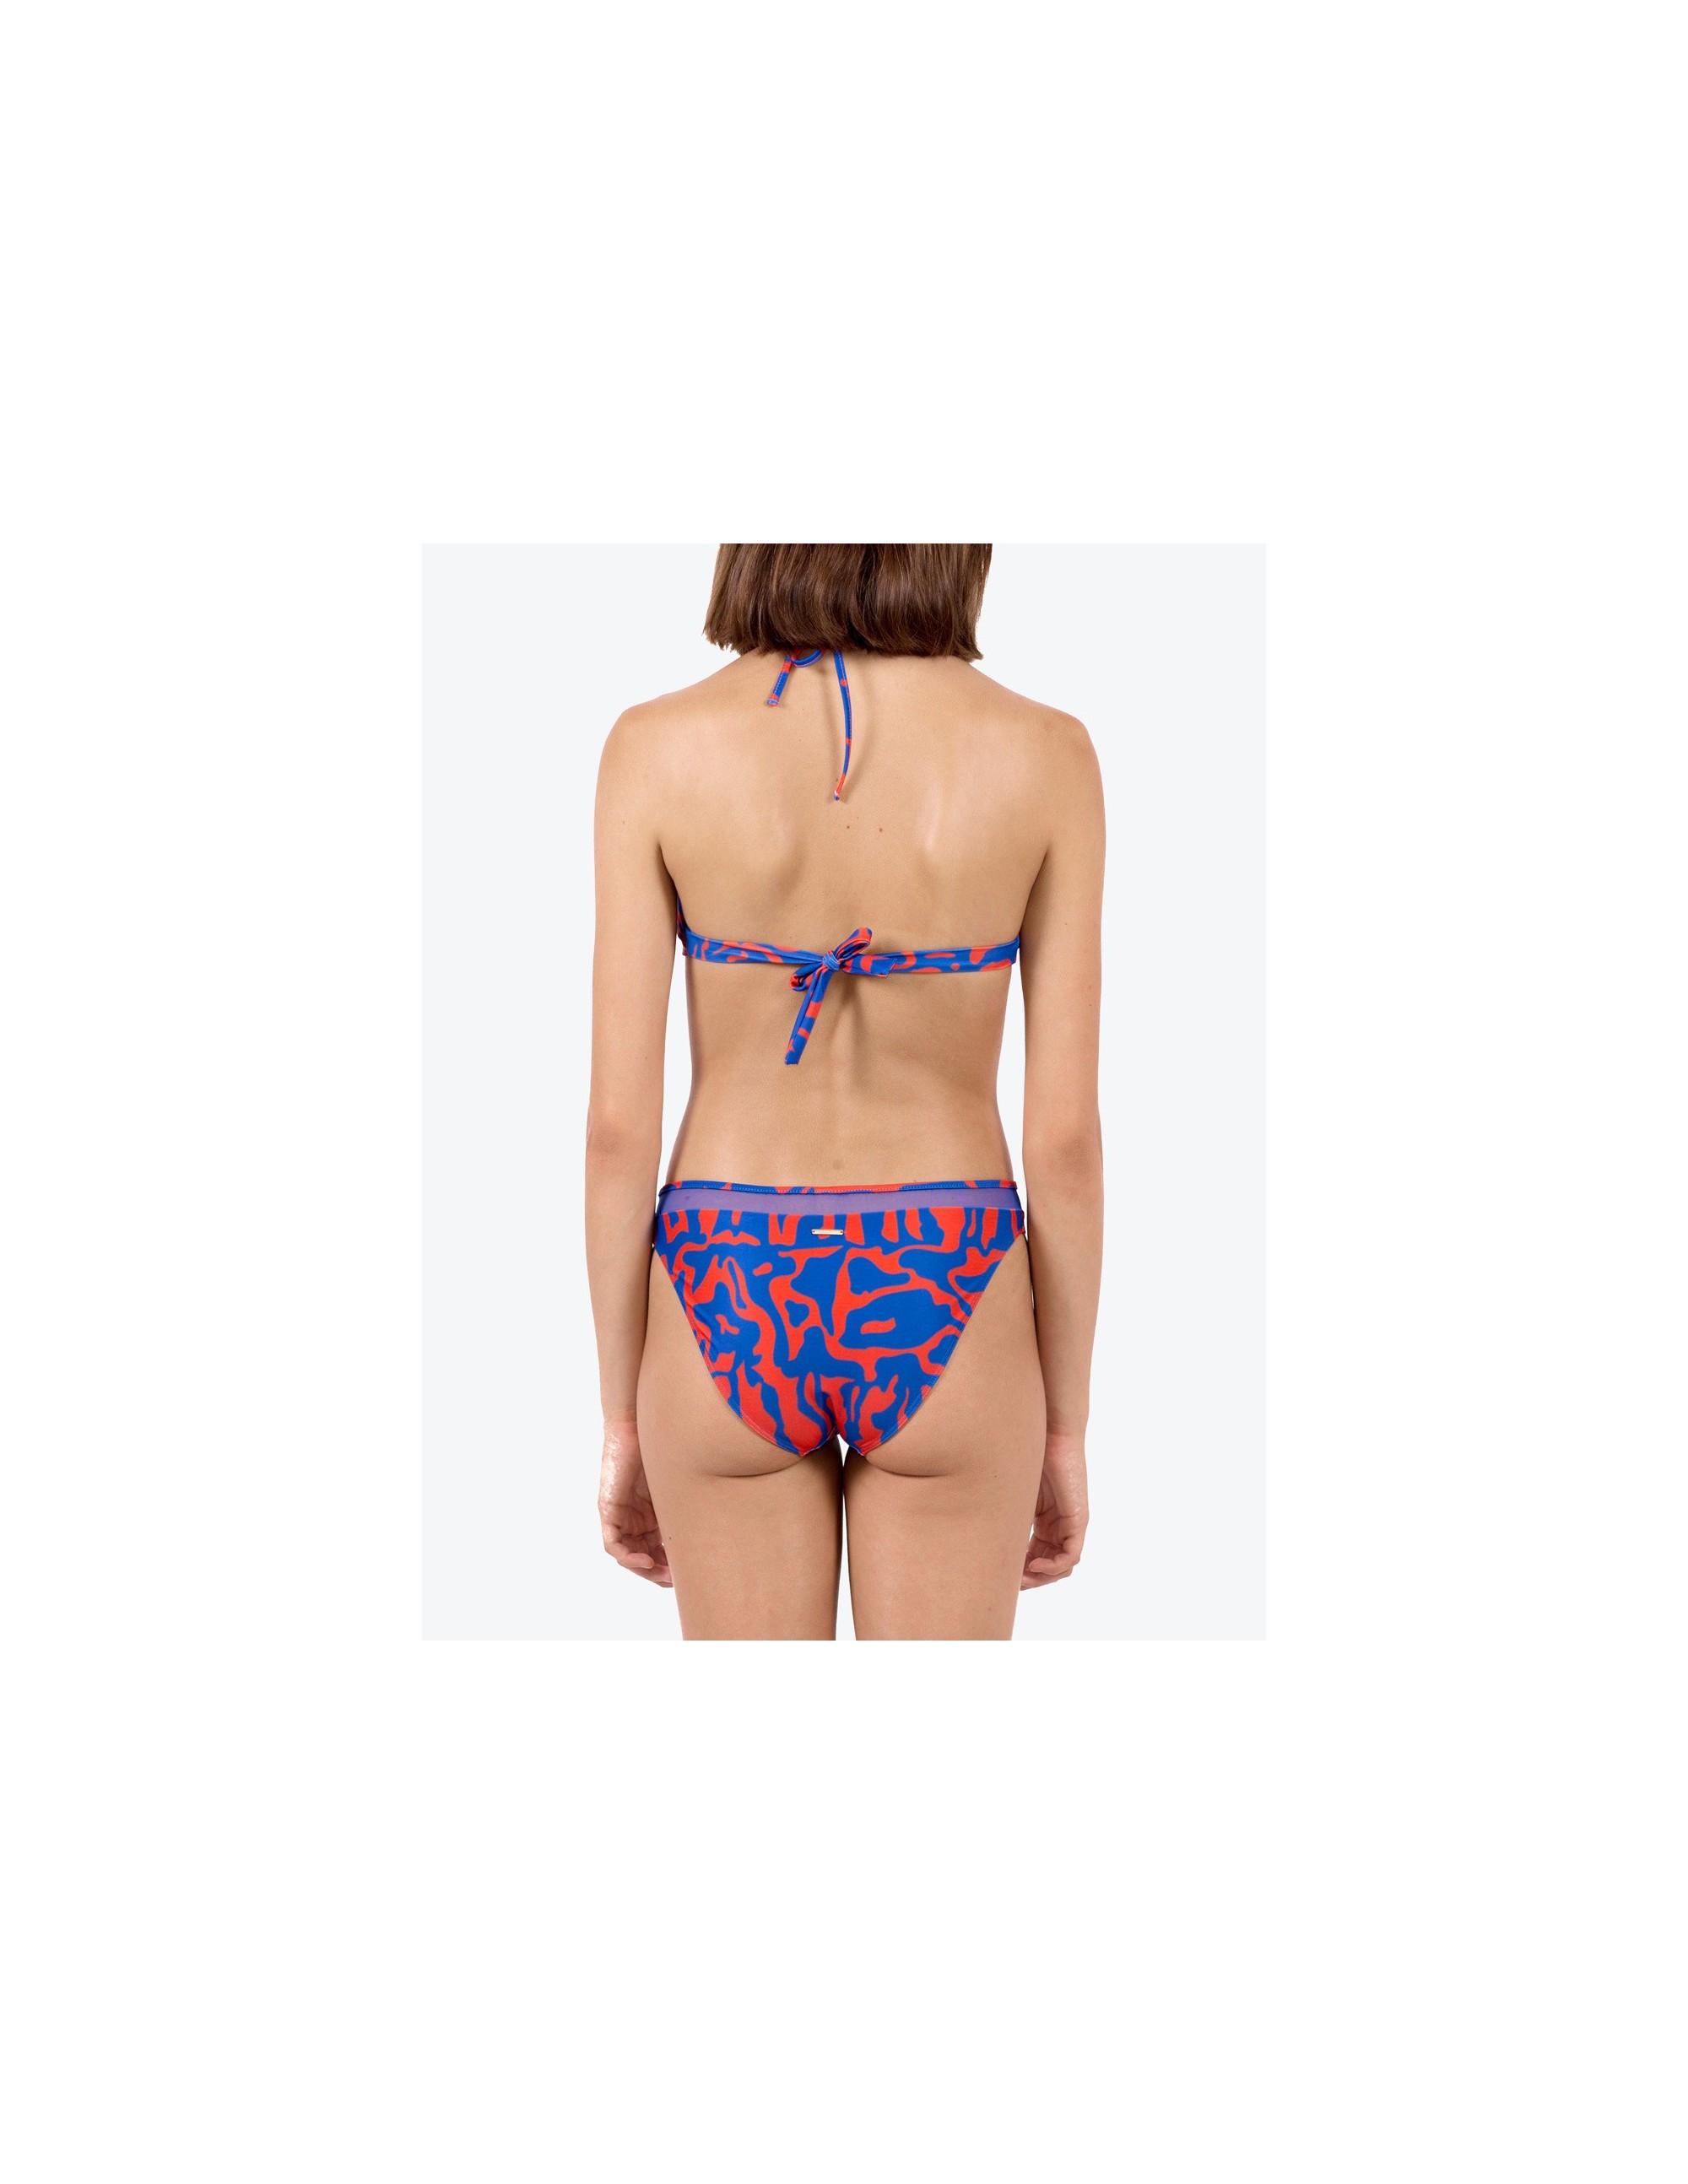 SAONA bikini top - MIMETRIC